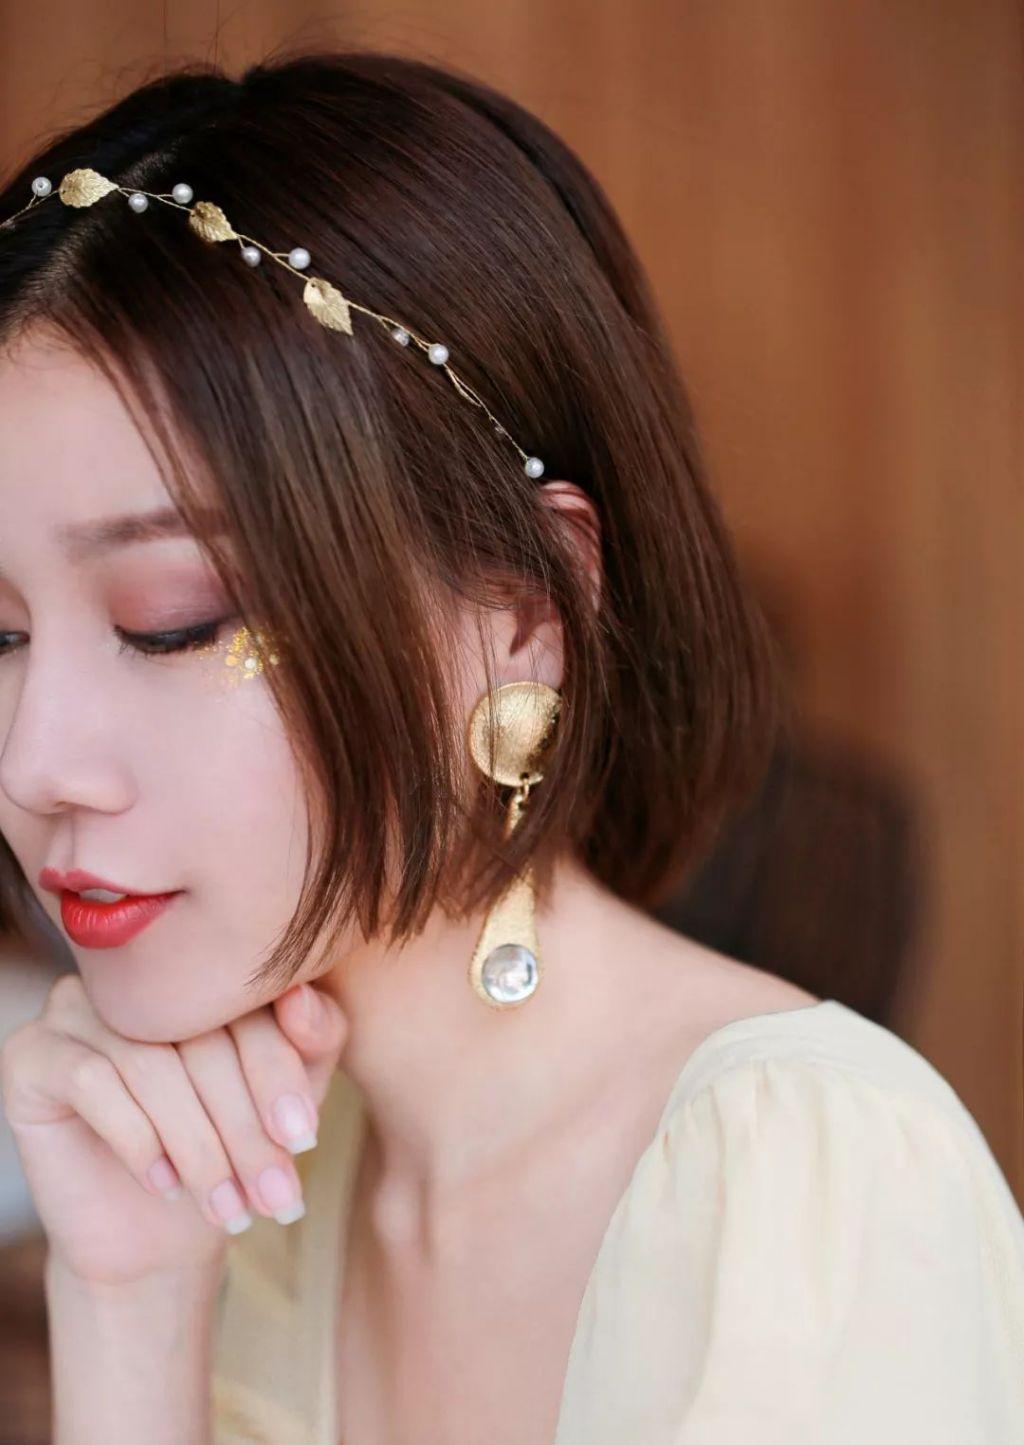 beauty blogger 1